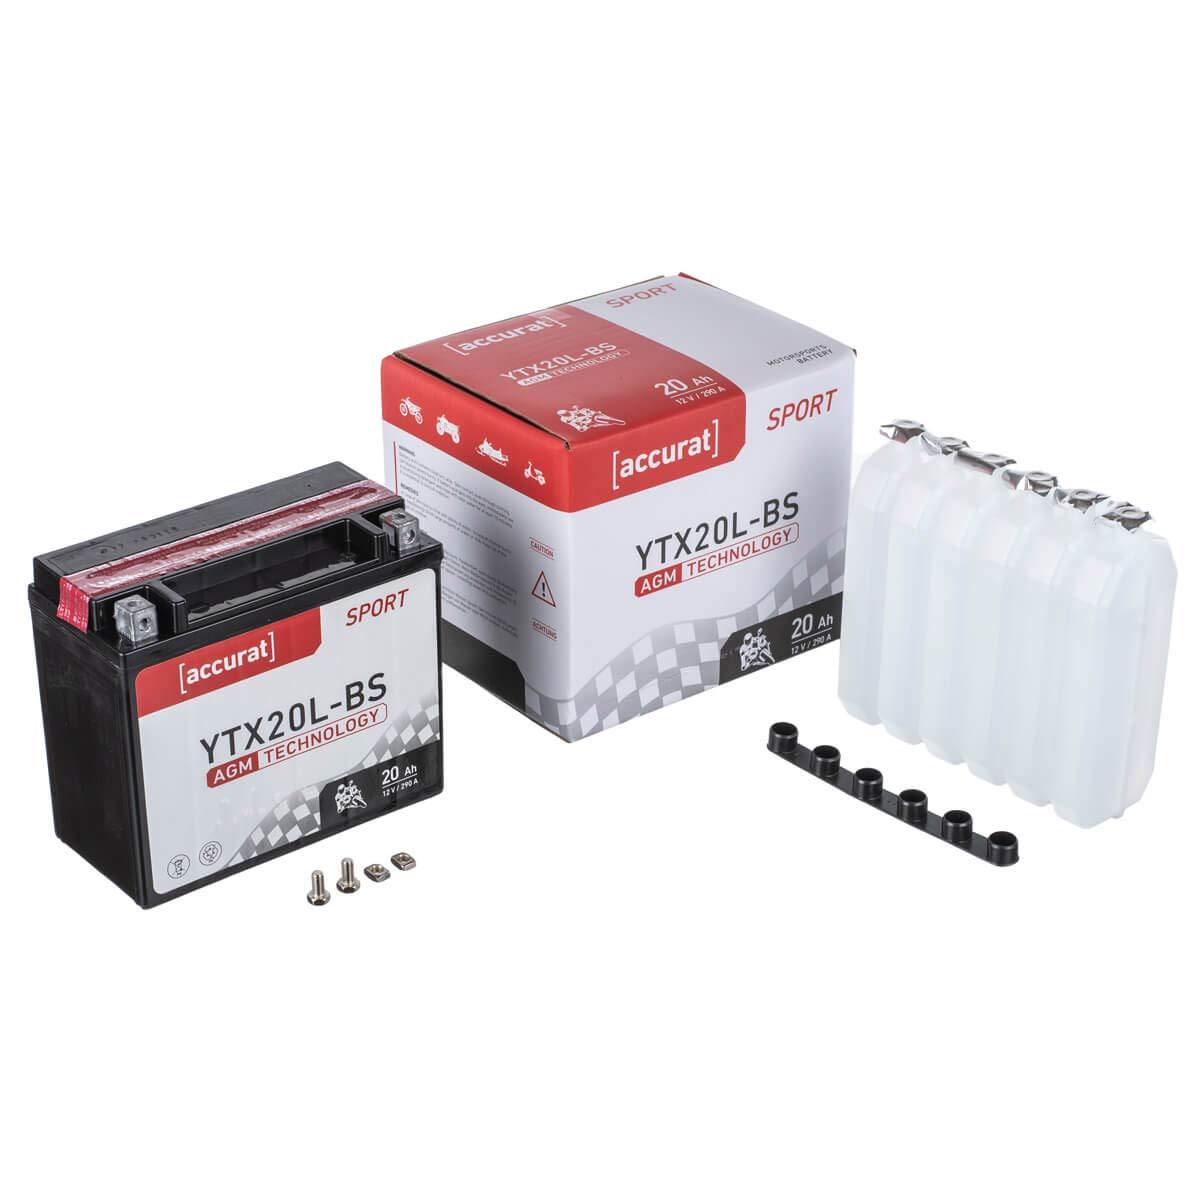 S/äurepack robust auslaufsicher /& wartungsfrei Accurat Motorradbatterie YTX9-BS 9Ah 120A 12V AGM-VRLA-Technologie Starterbatterie inkl